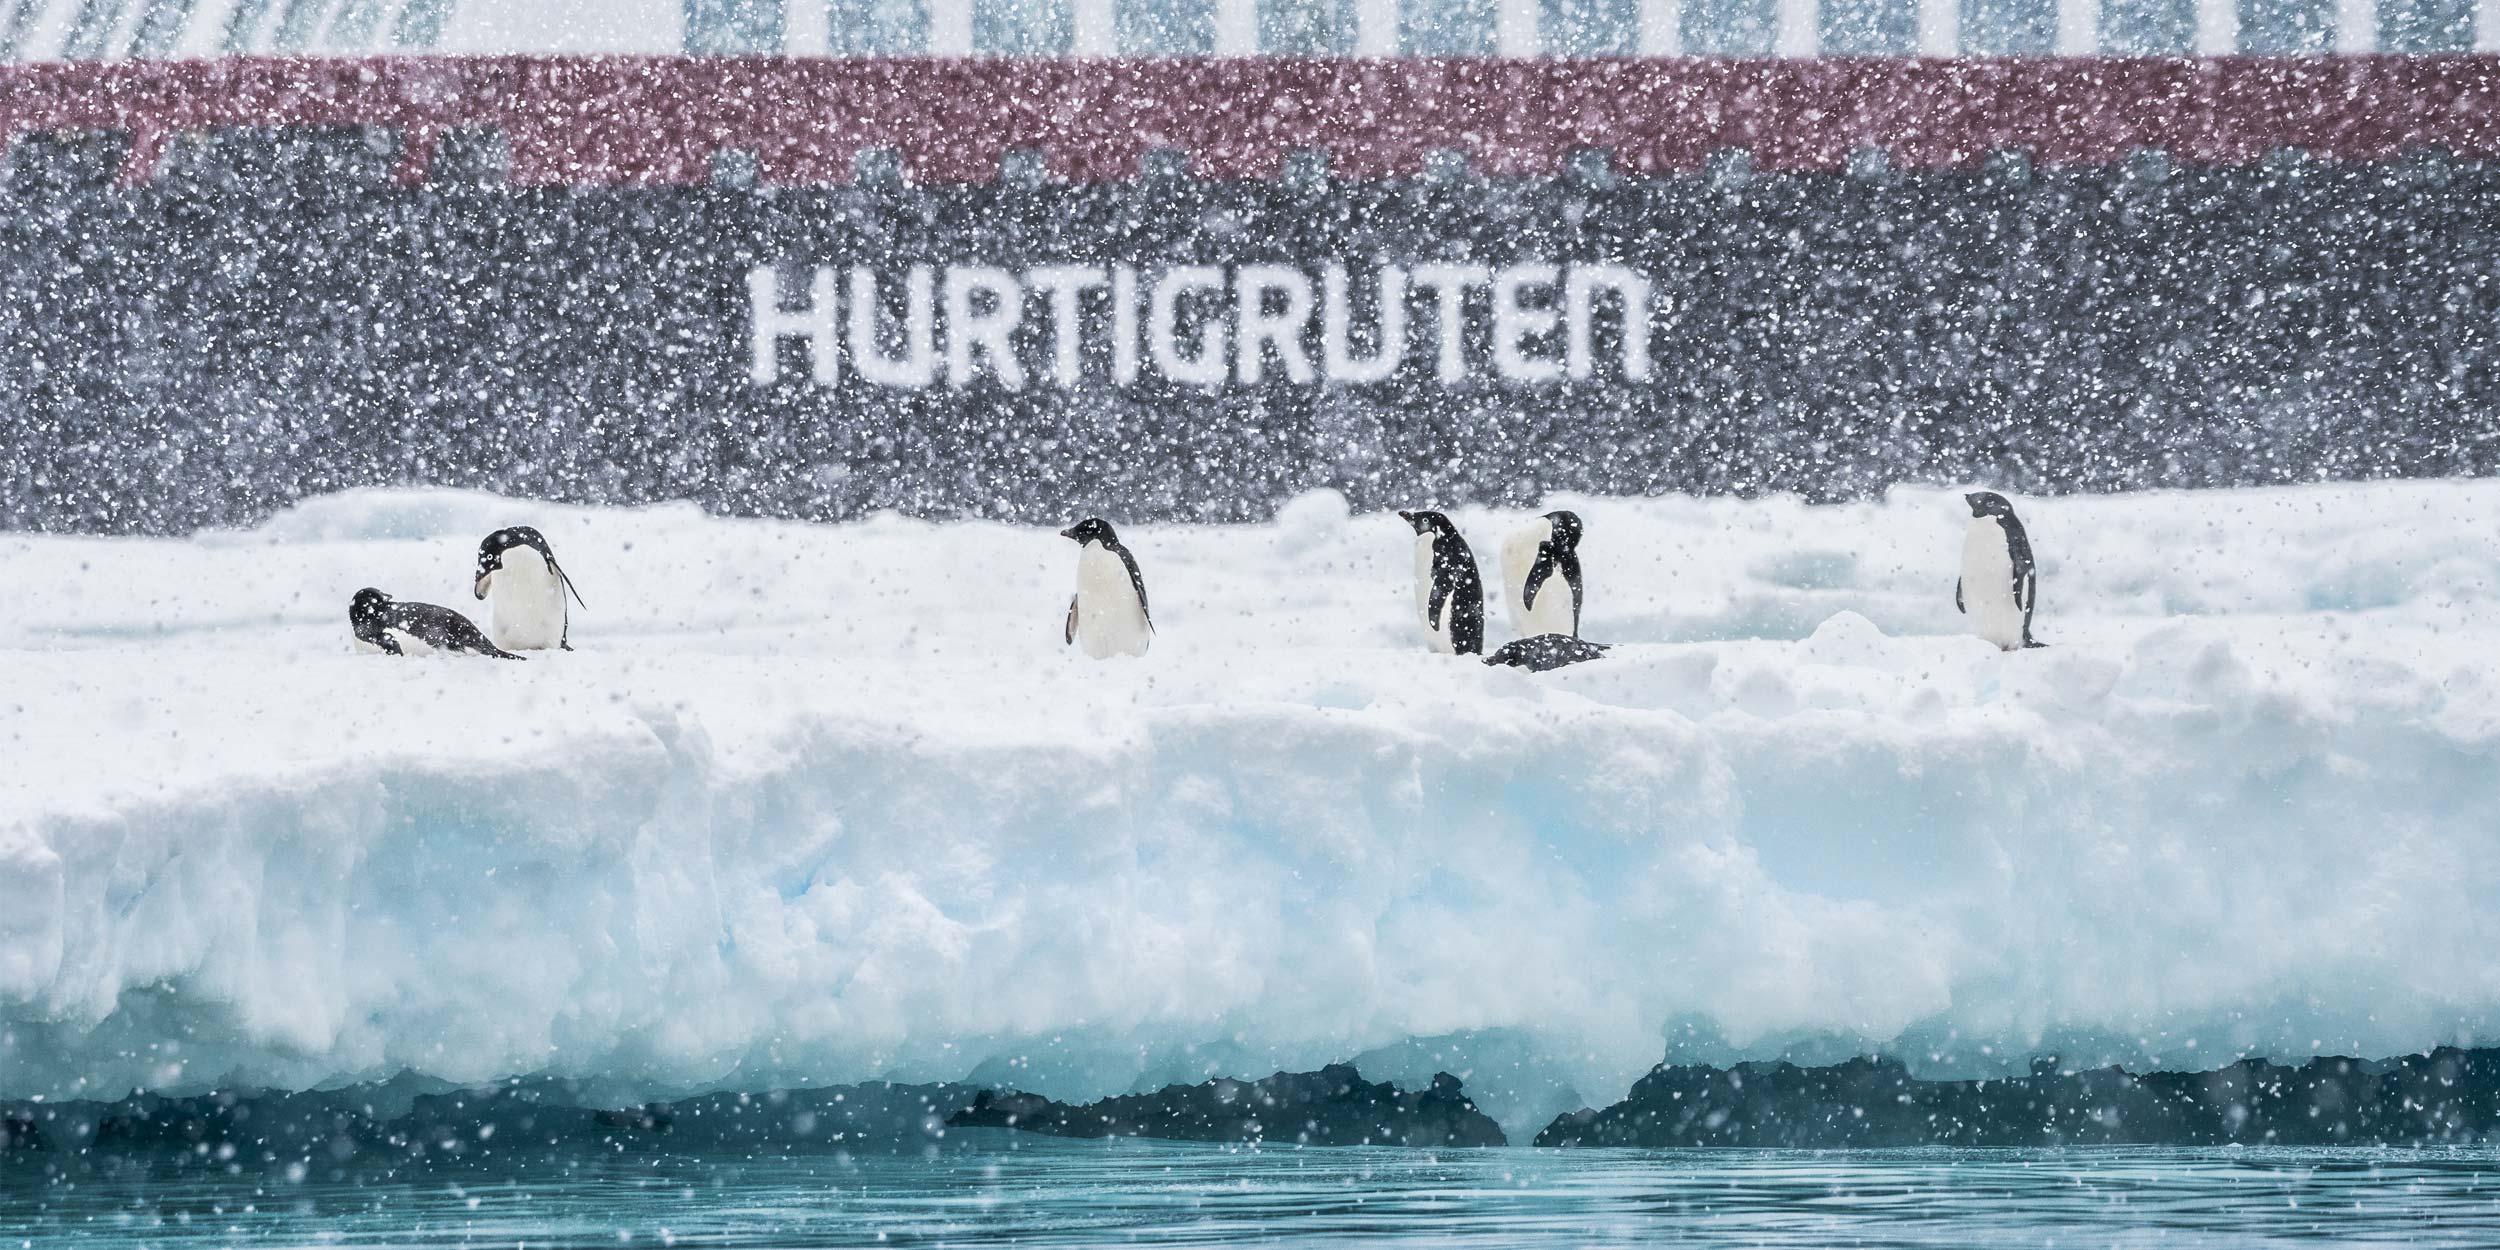 New Year 2019 in Antarctica 100